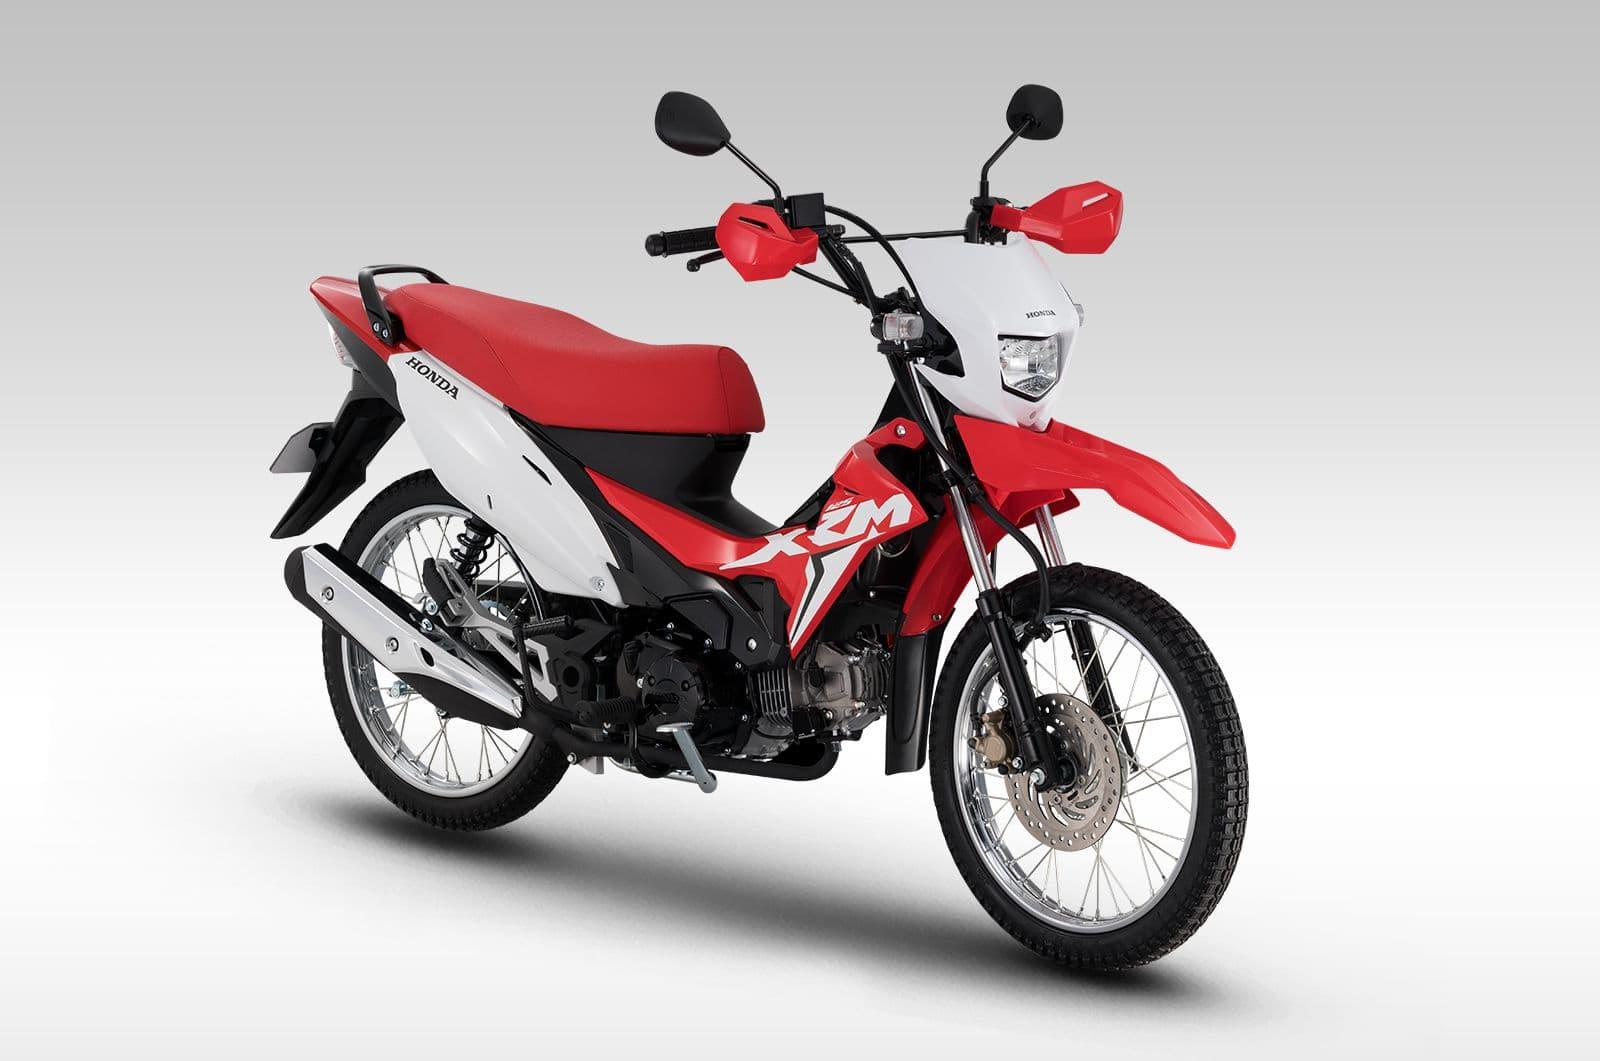 Xrm Honda Parts | Webmotor.org